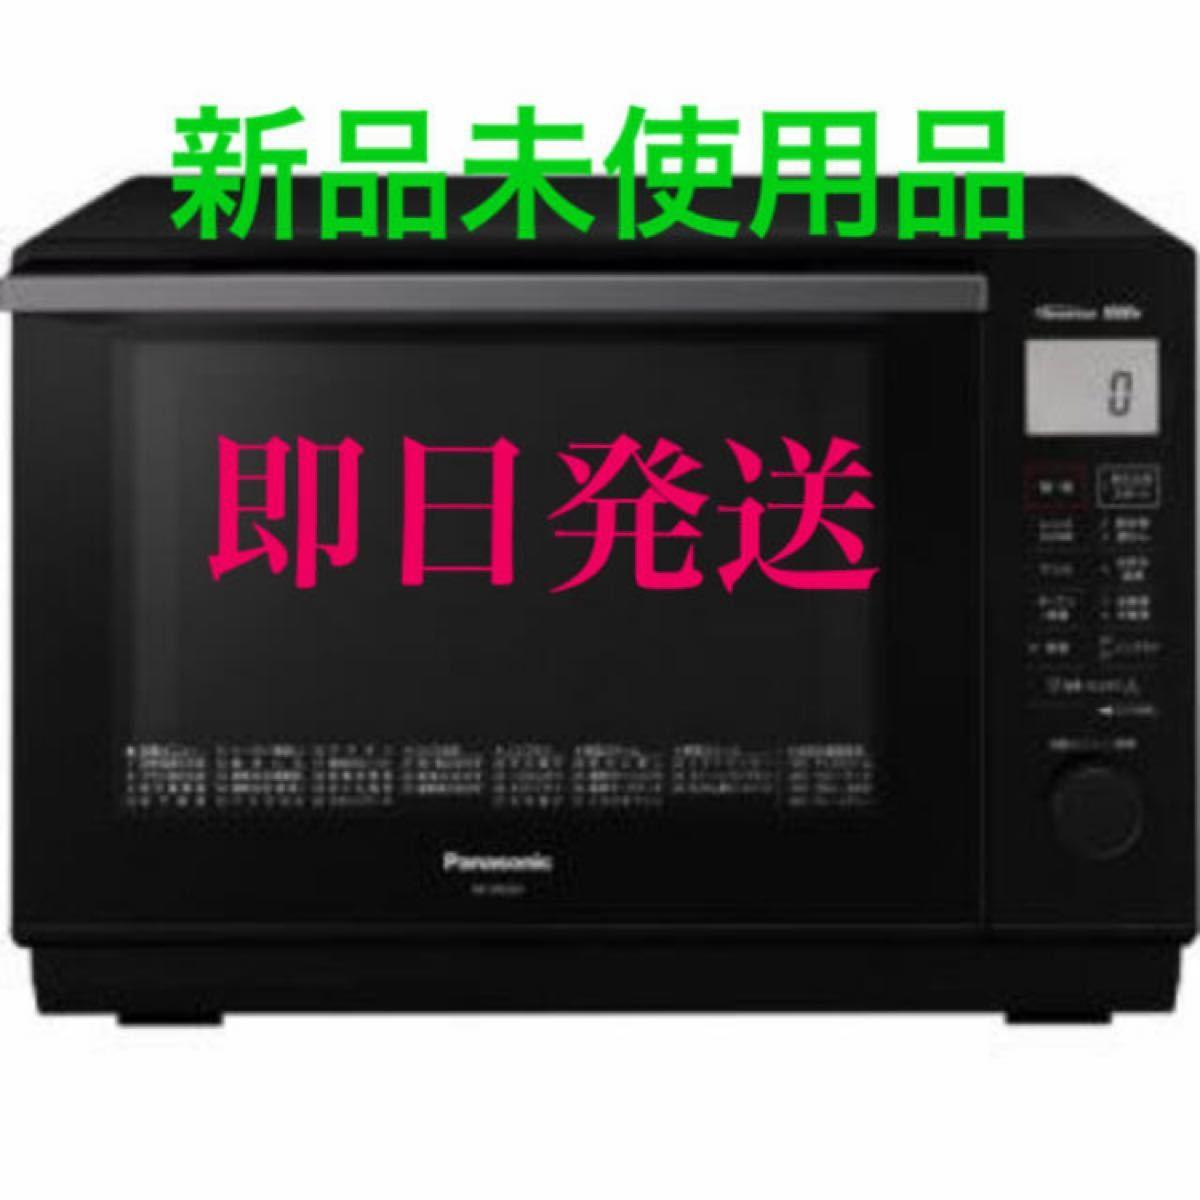 Panasonic パナソニック NE-MS267-K オーブンレンジ エレック 1段調理タイプ 26L